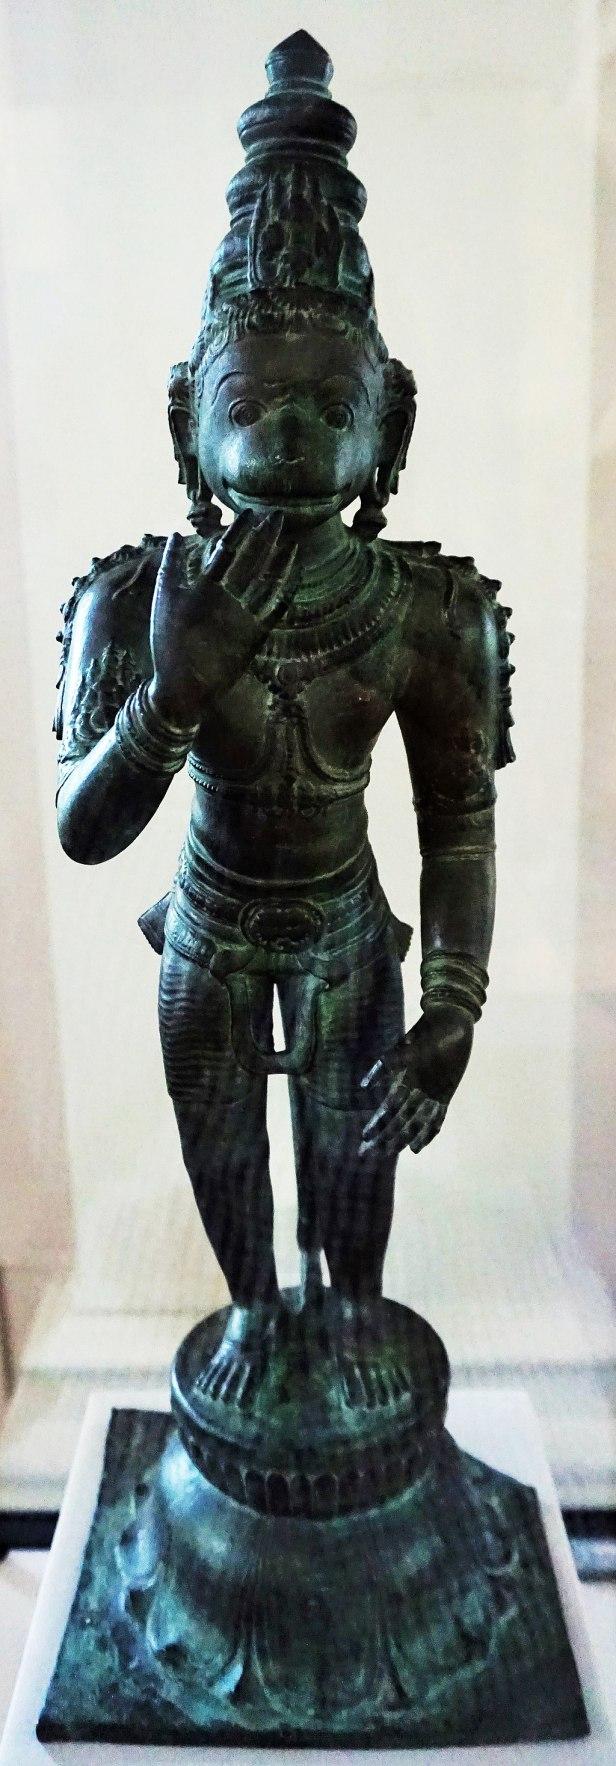 Asian Civilisations Museum - Joy of Museums - Hanuman